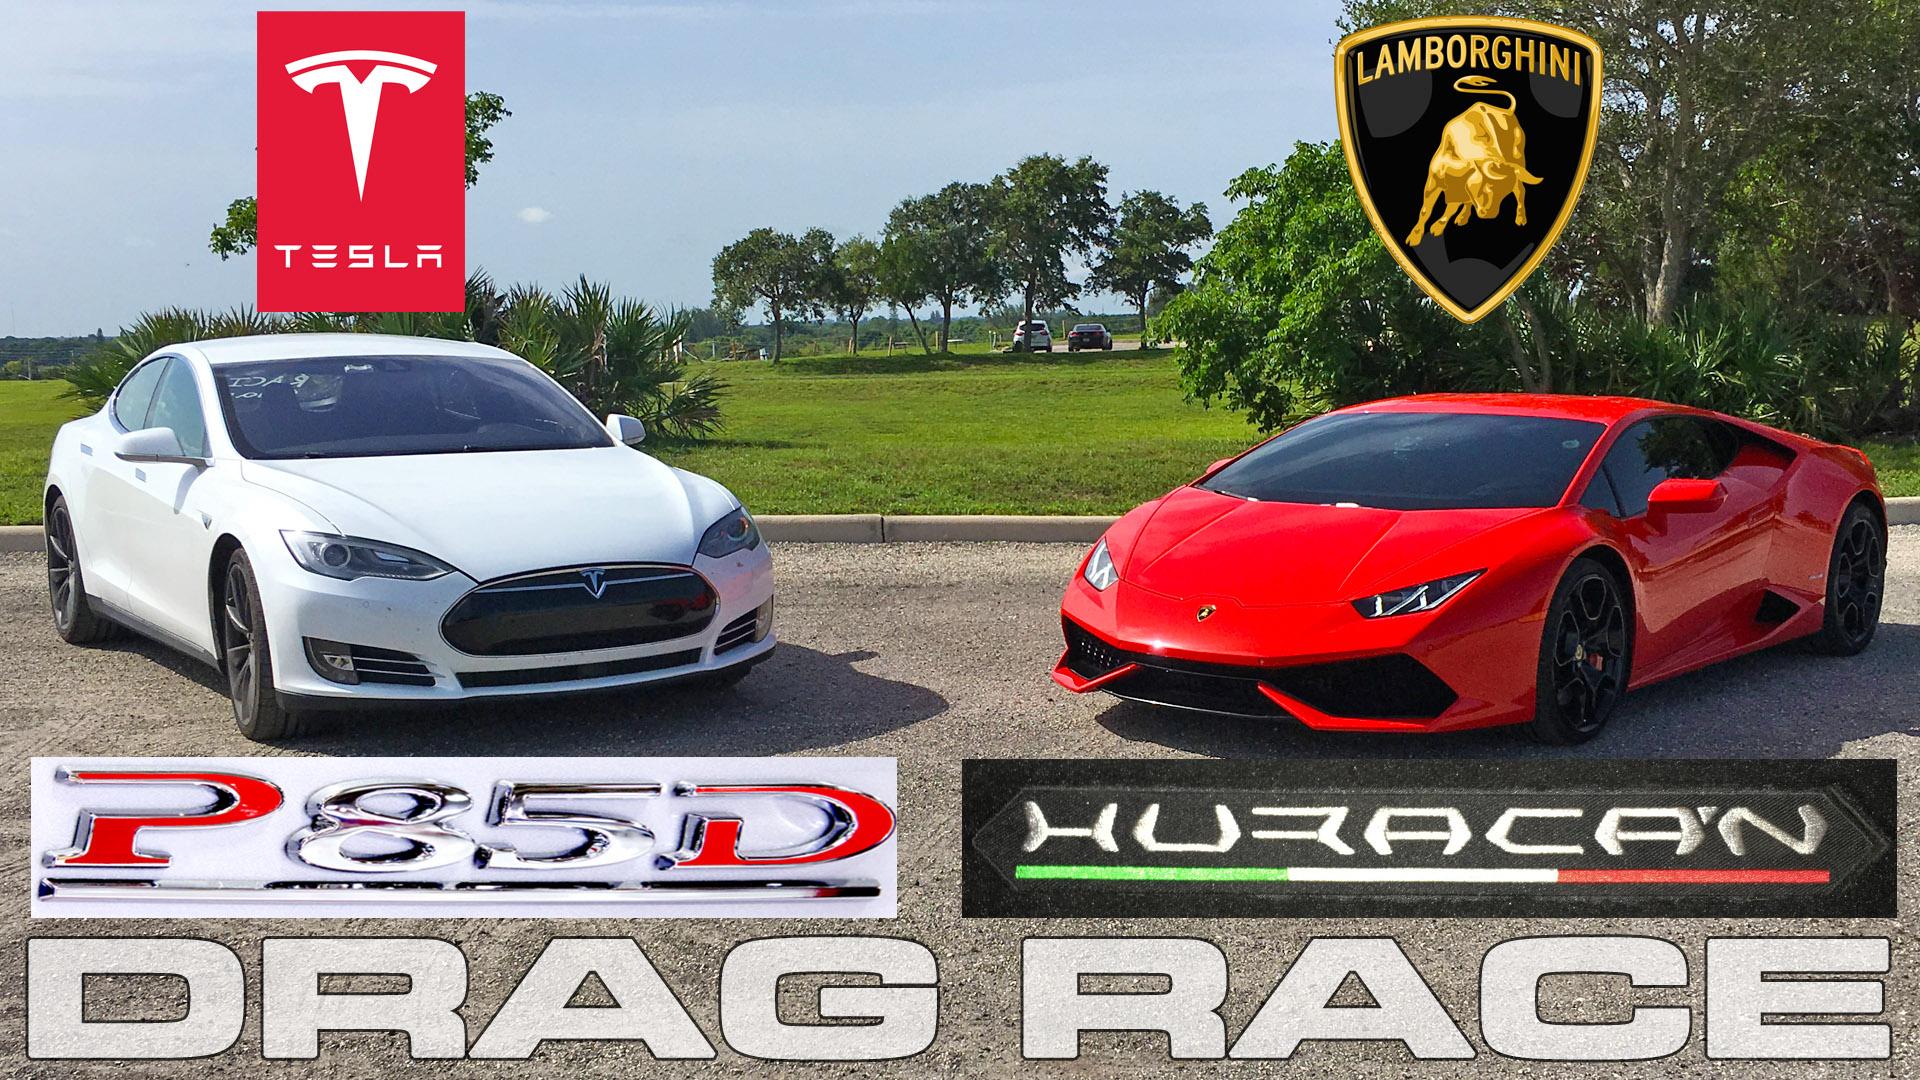 lamborghini-huracan-vs-tesla-p85d-ludicrous-drag-racing